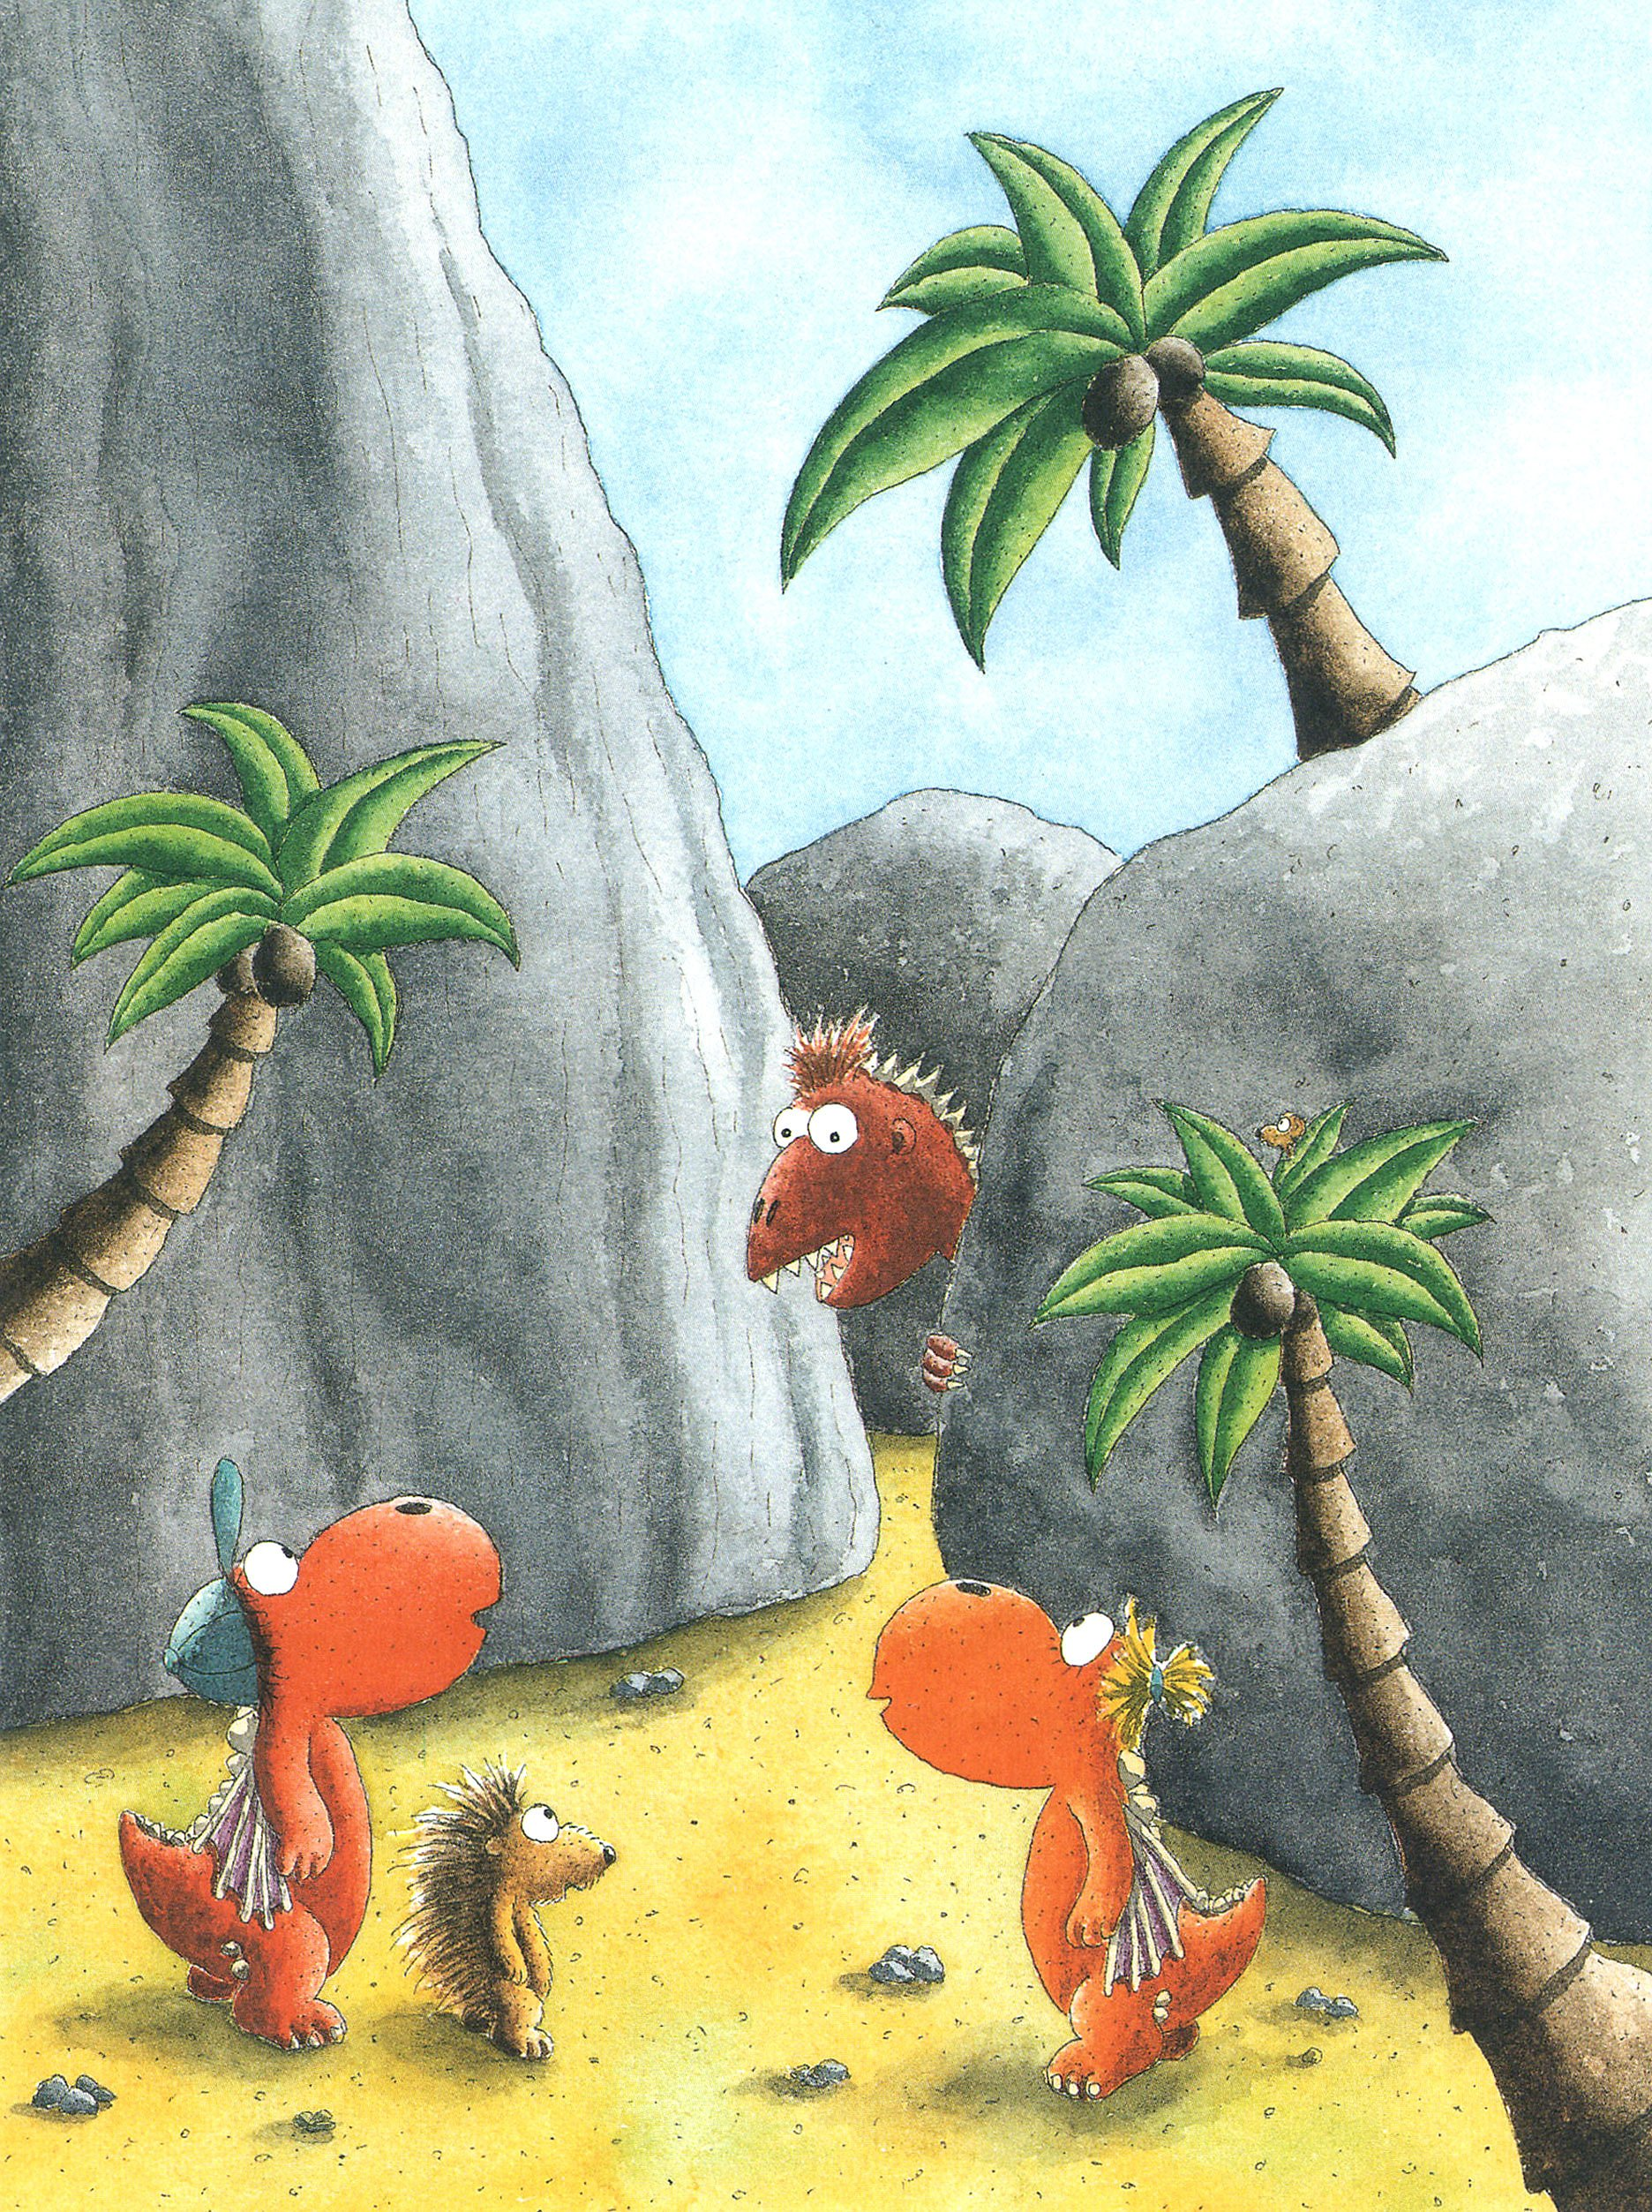 der kleine drache kokosnuss wallpapers high quality